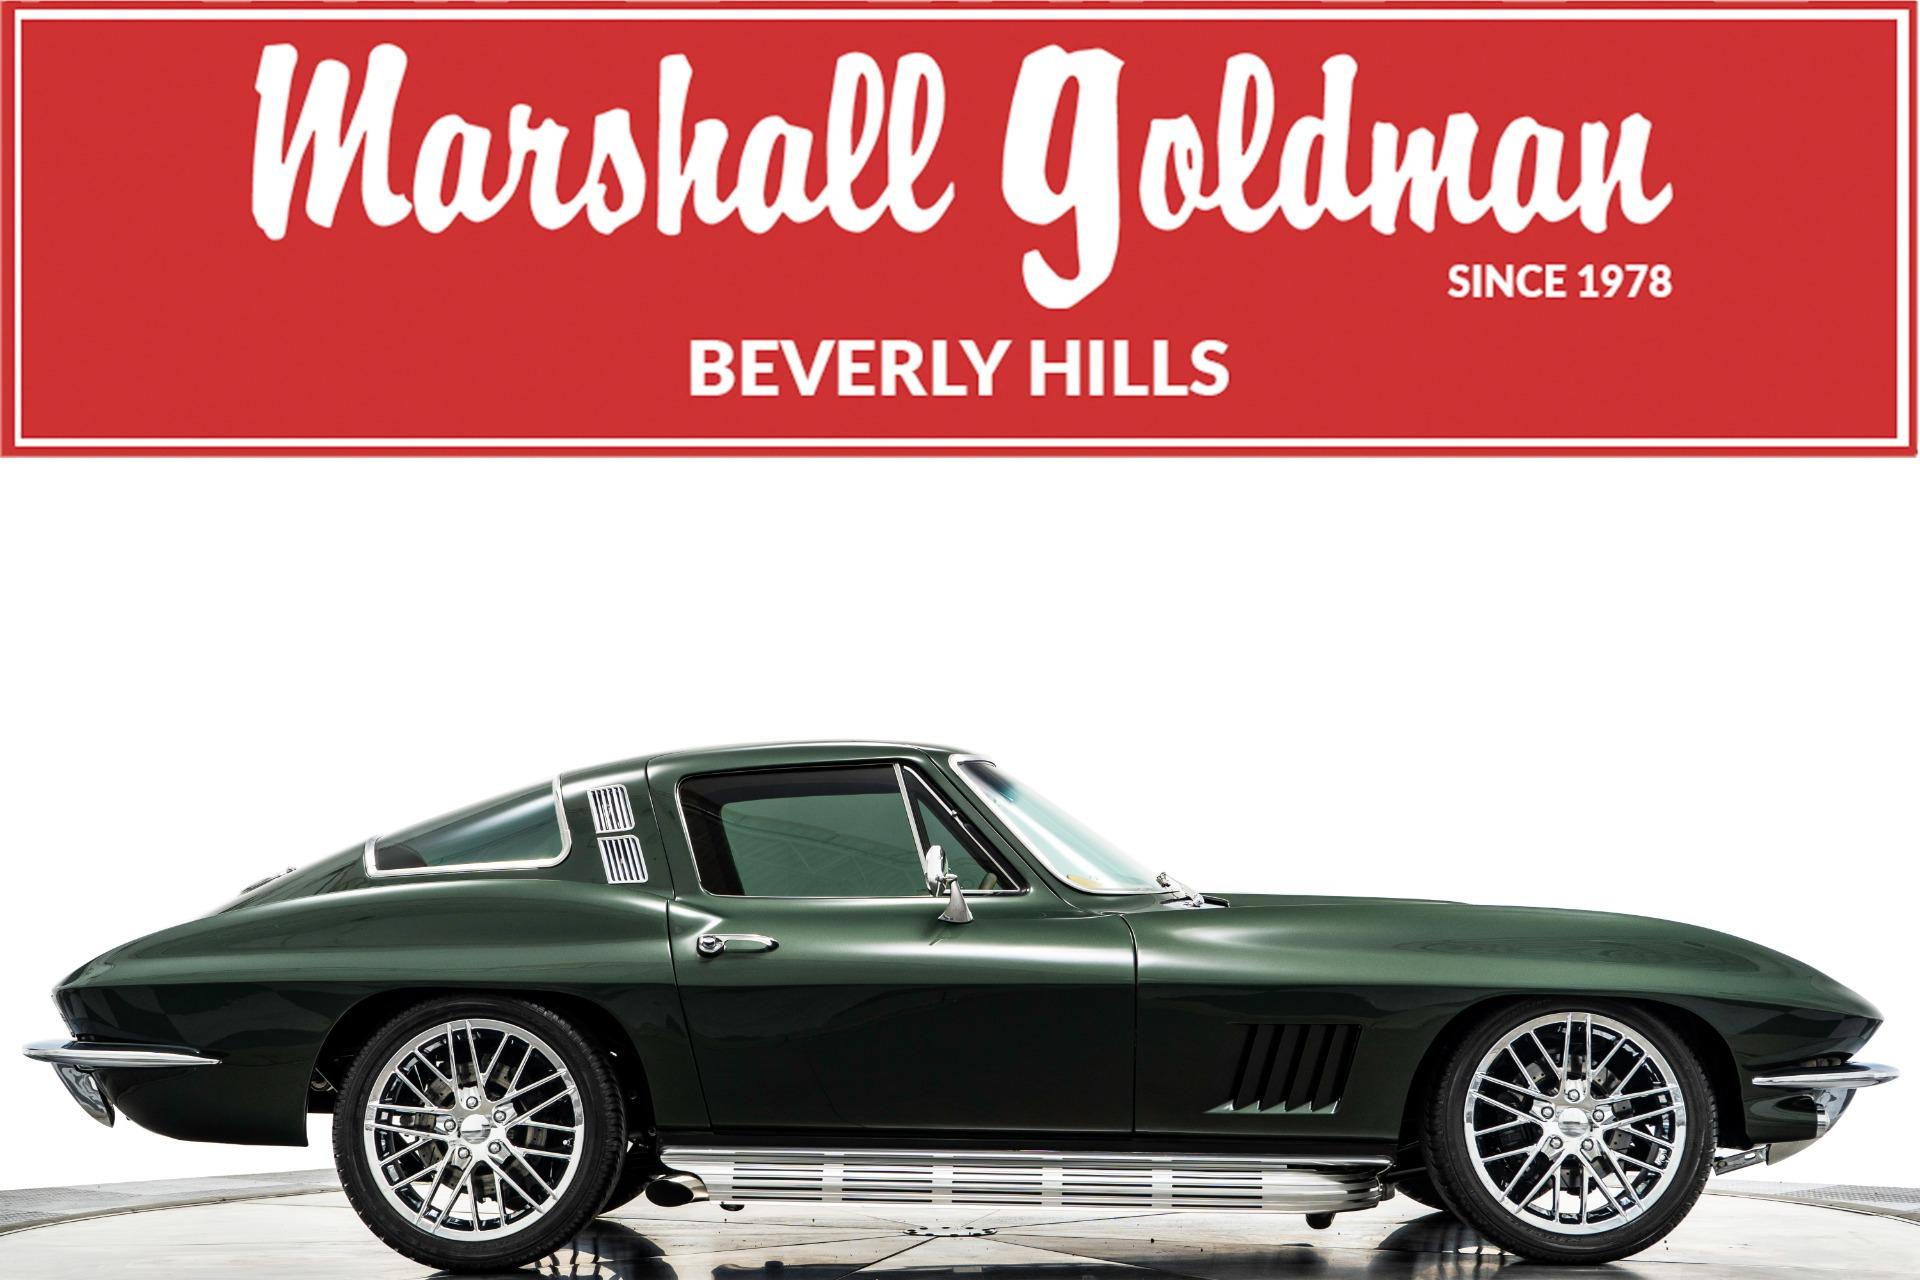 Used 1964 Chevrolet Corvette Restomod For Sale Sold Marshall Goldman Motor Sales Stock B21057